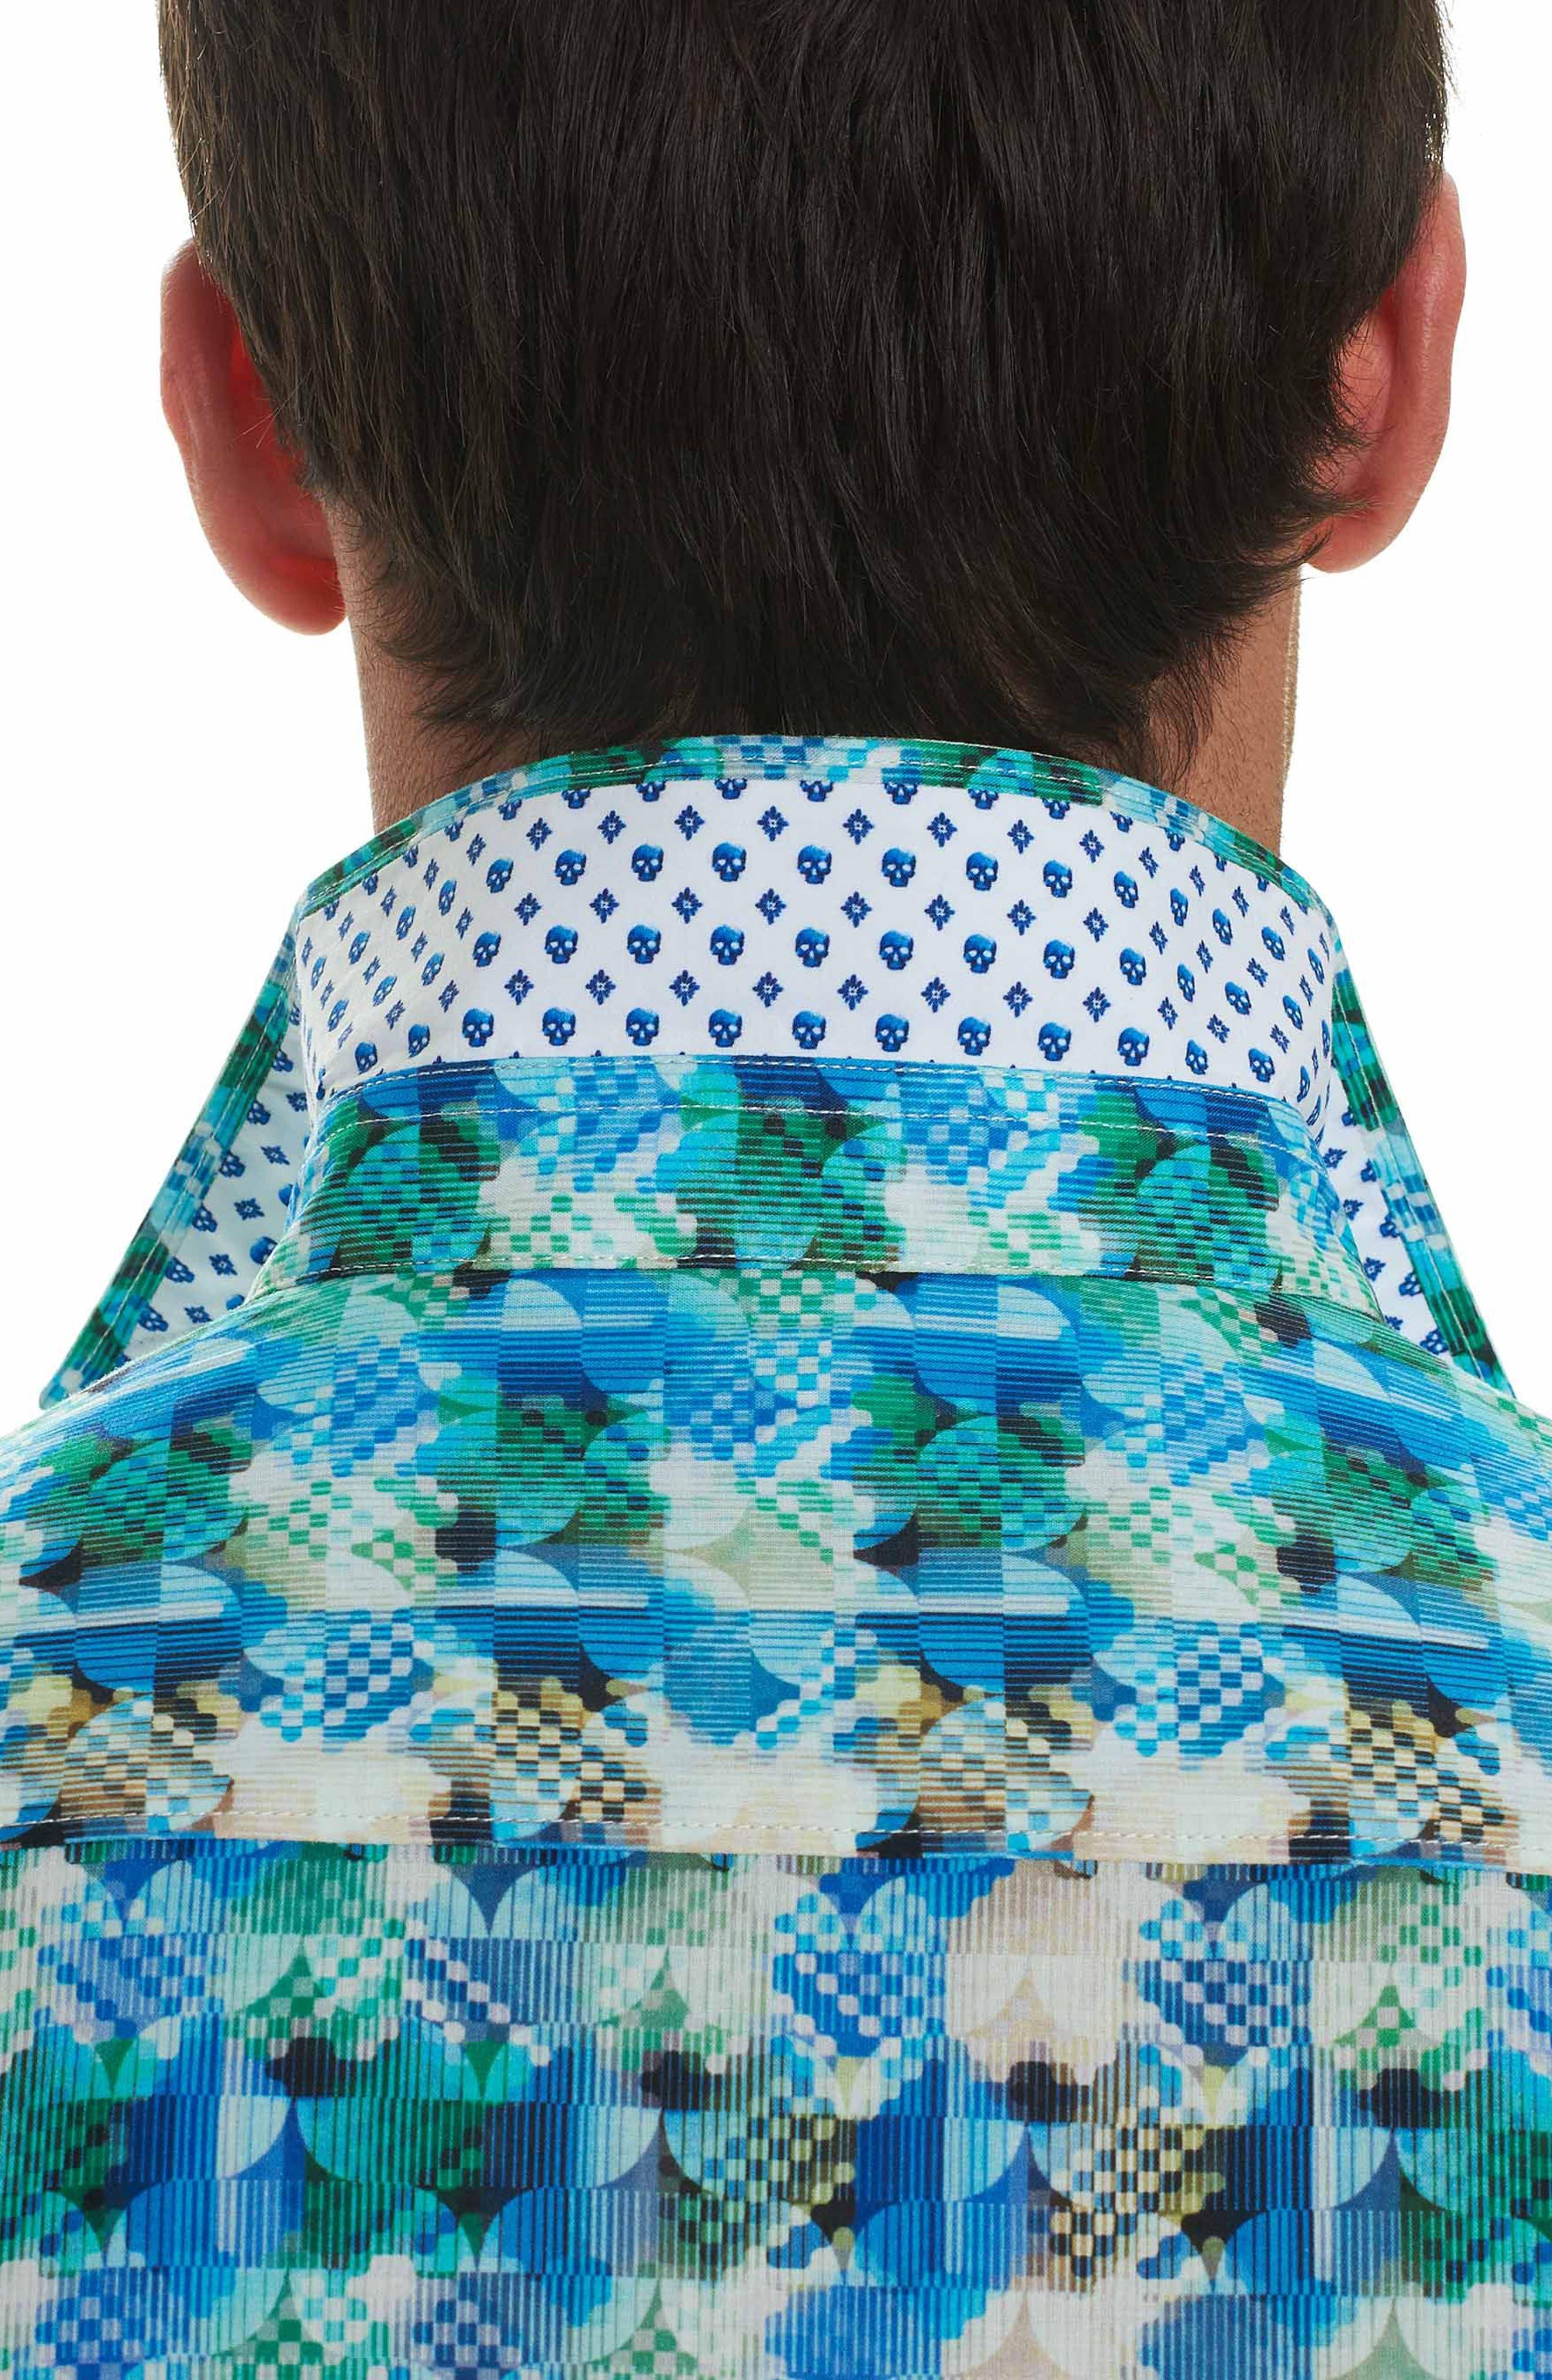 Illusions Sport Shirt,                             Alternate thumbnail 3, color,                             Turquoise